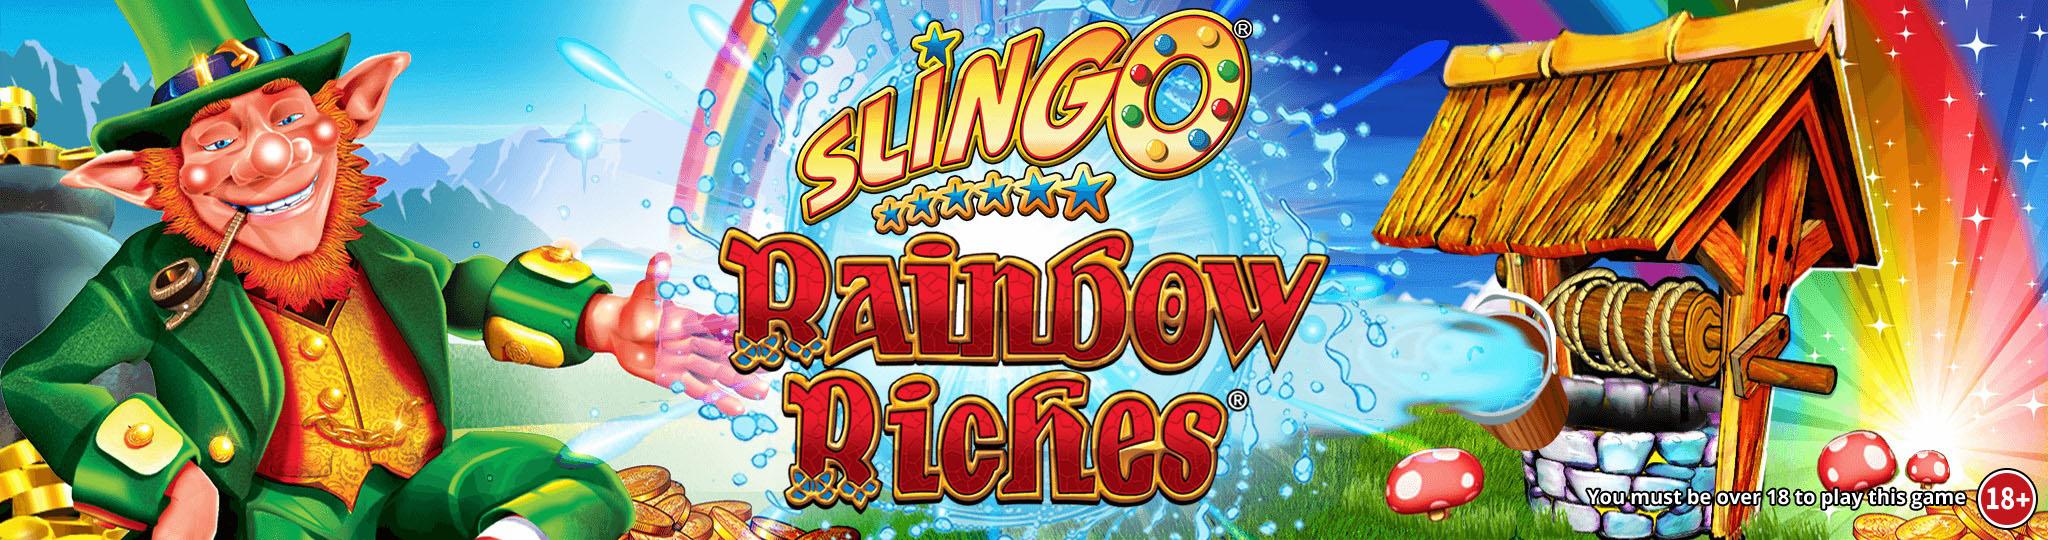 Slingo Rainbow Riches Slot Logo Umbingo